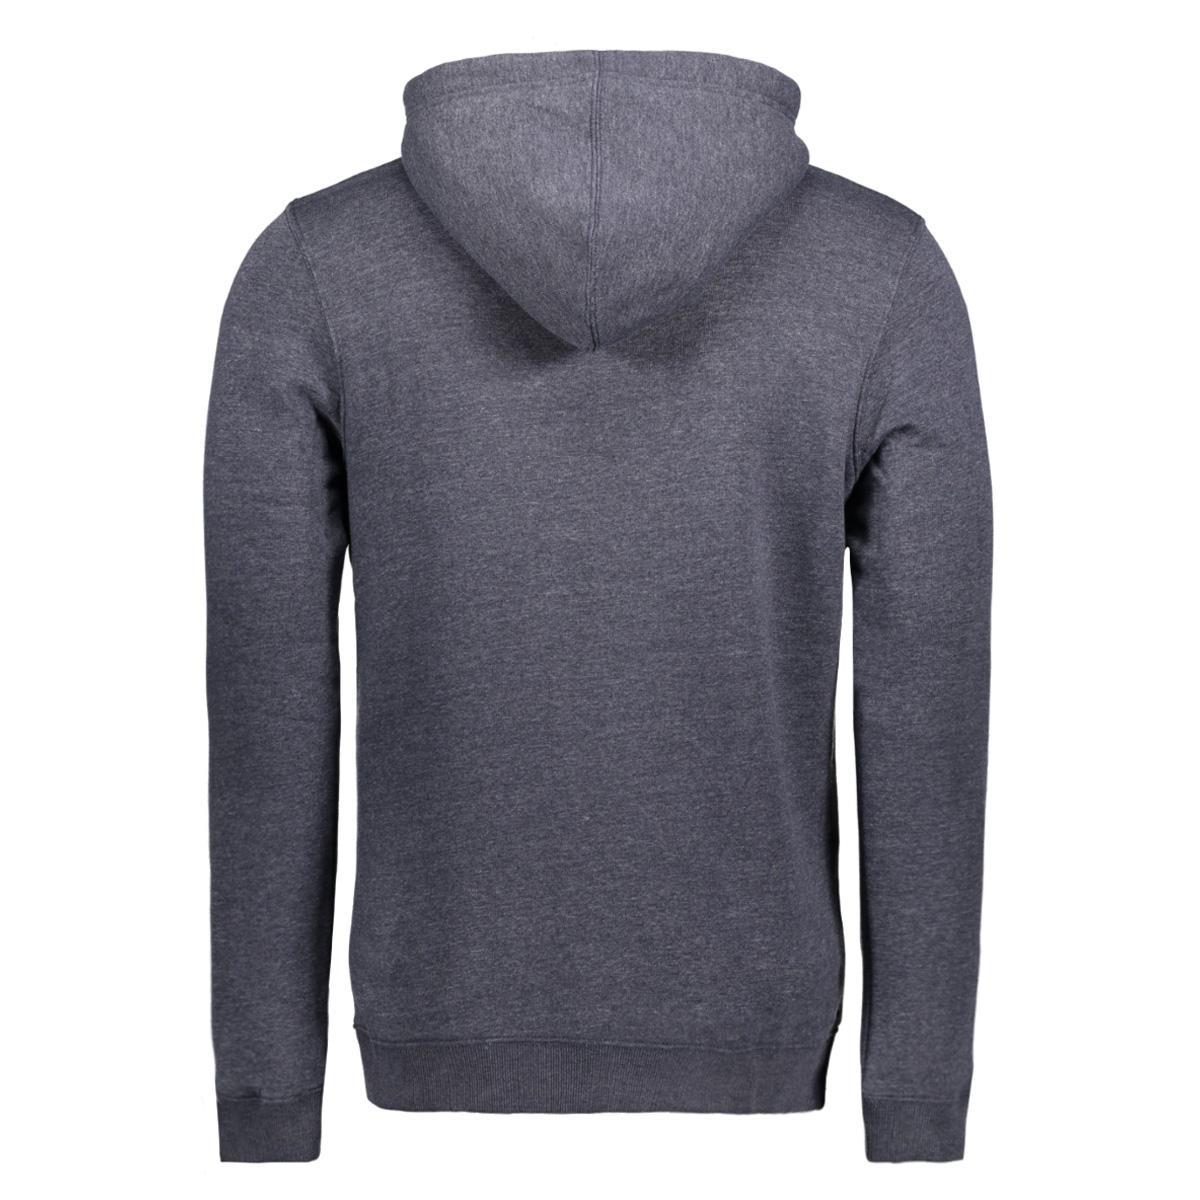 2555162.09.12 tom tailor sweater 6576